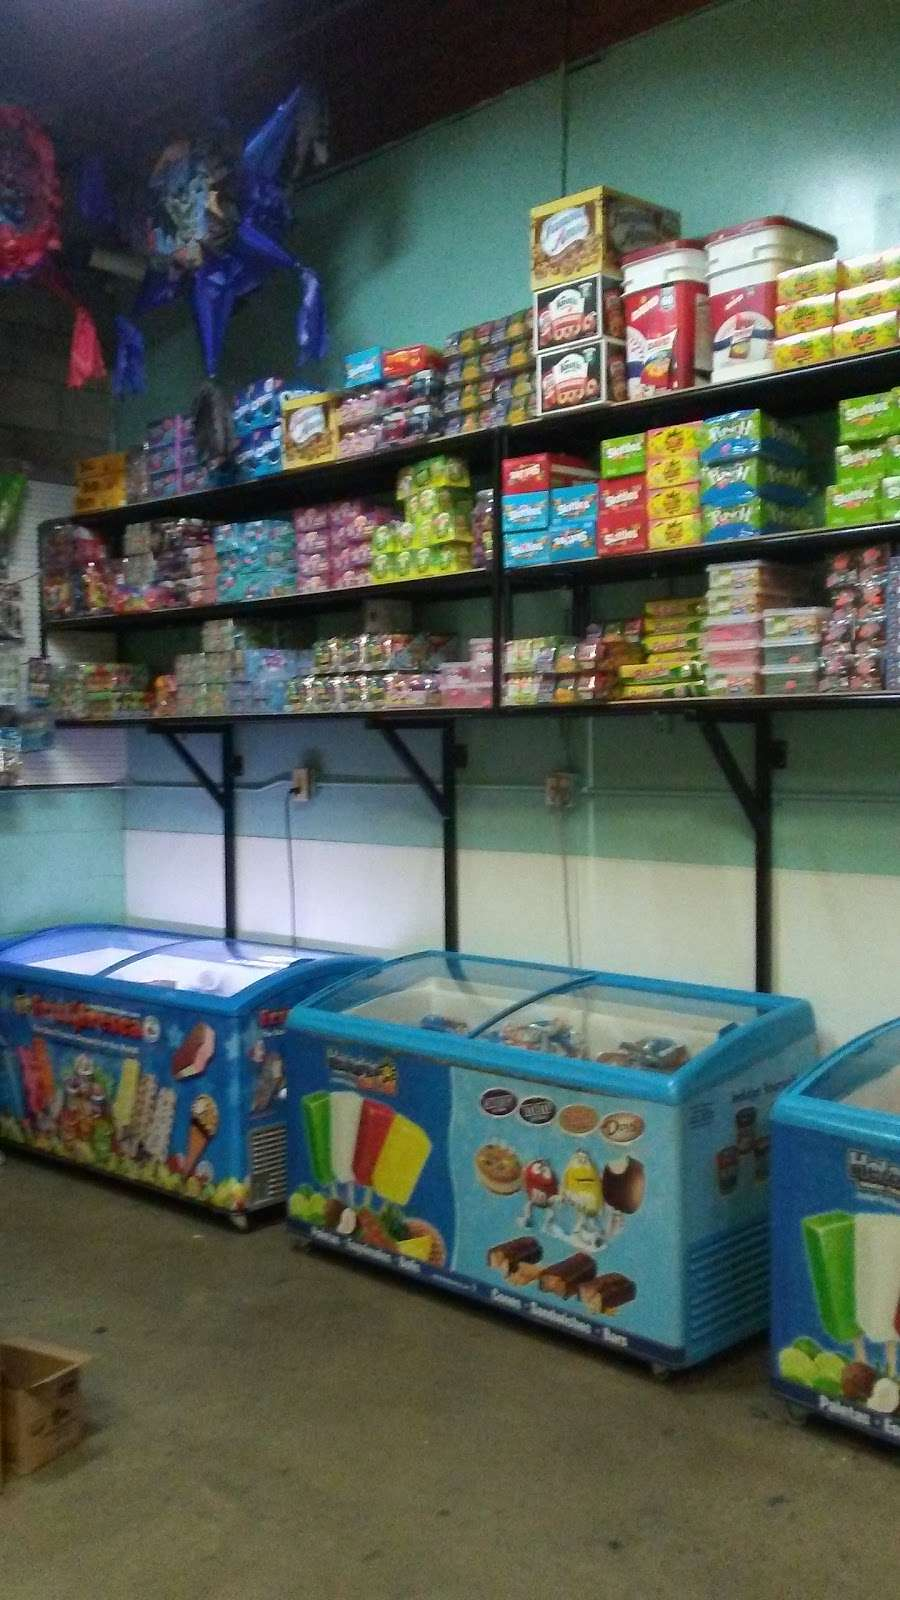 Paleteria Hidalgo - store    Photo 5 of 10   Address: 16565 Orange Way # I, Fontana, CA 92335, USA   Phone: (909) 350-4130